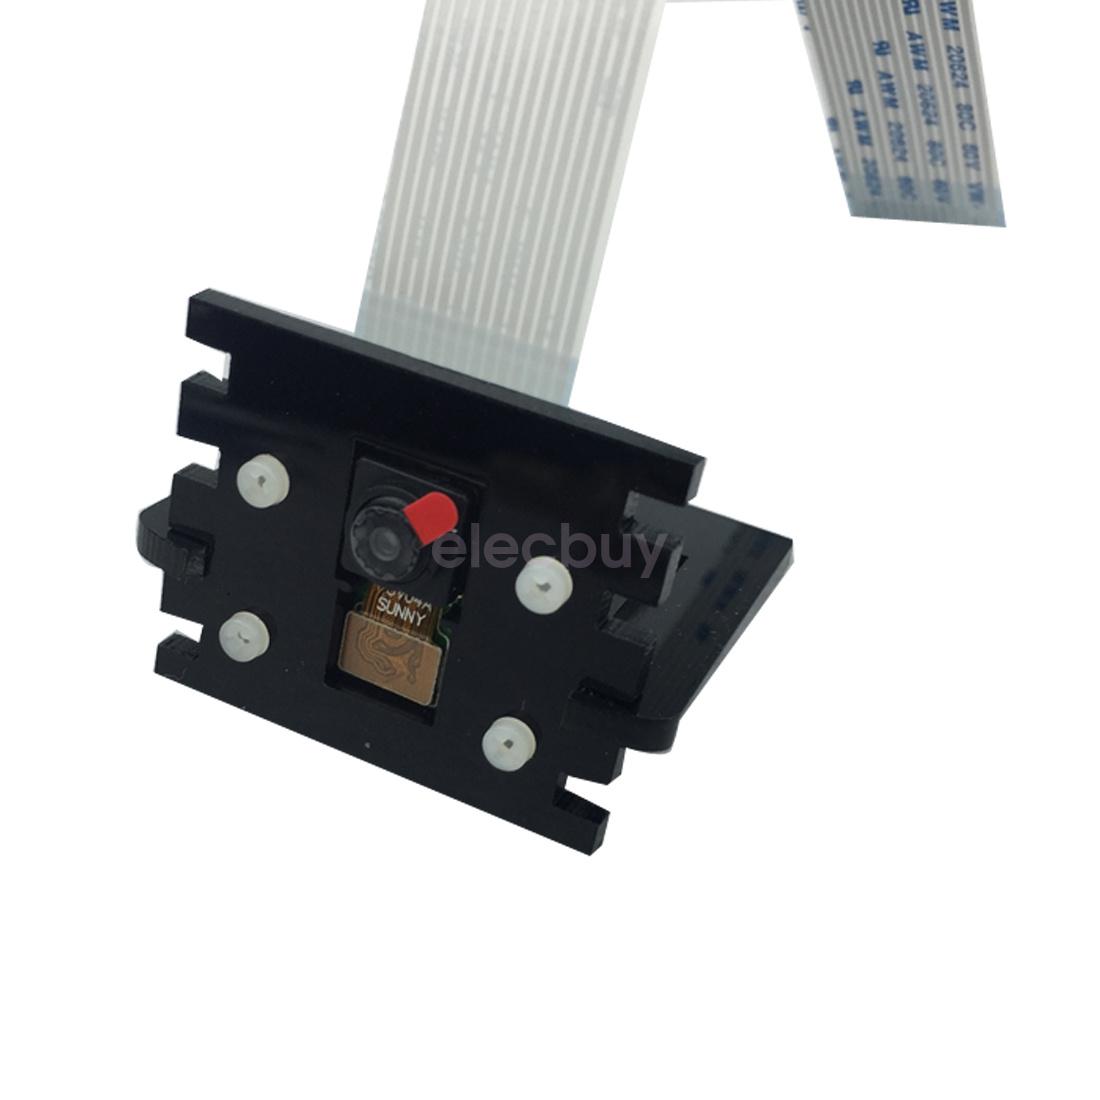 Red Blue Black Adjustable Camera Mount Holder Mini Stand Bracket F Raspberry Pi